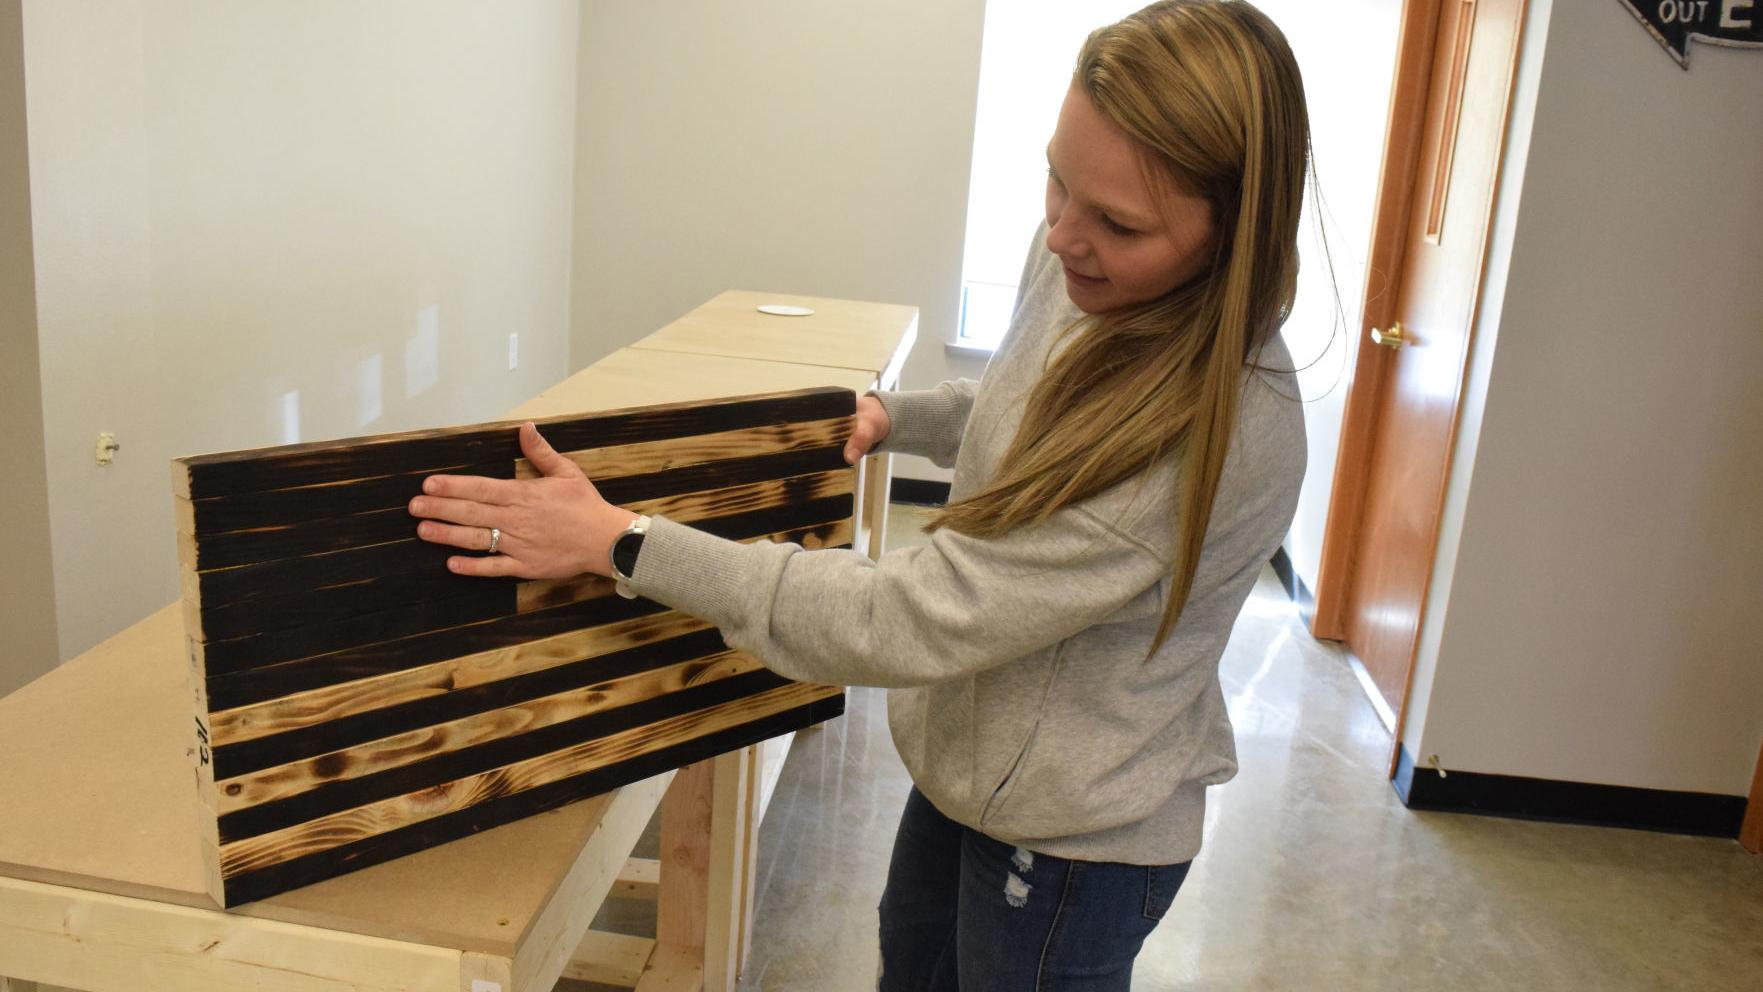 New Prairie du Sac business offers DIY experience